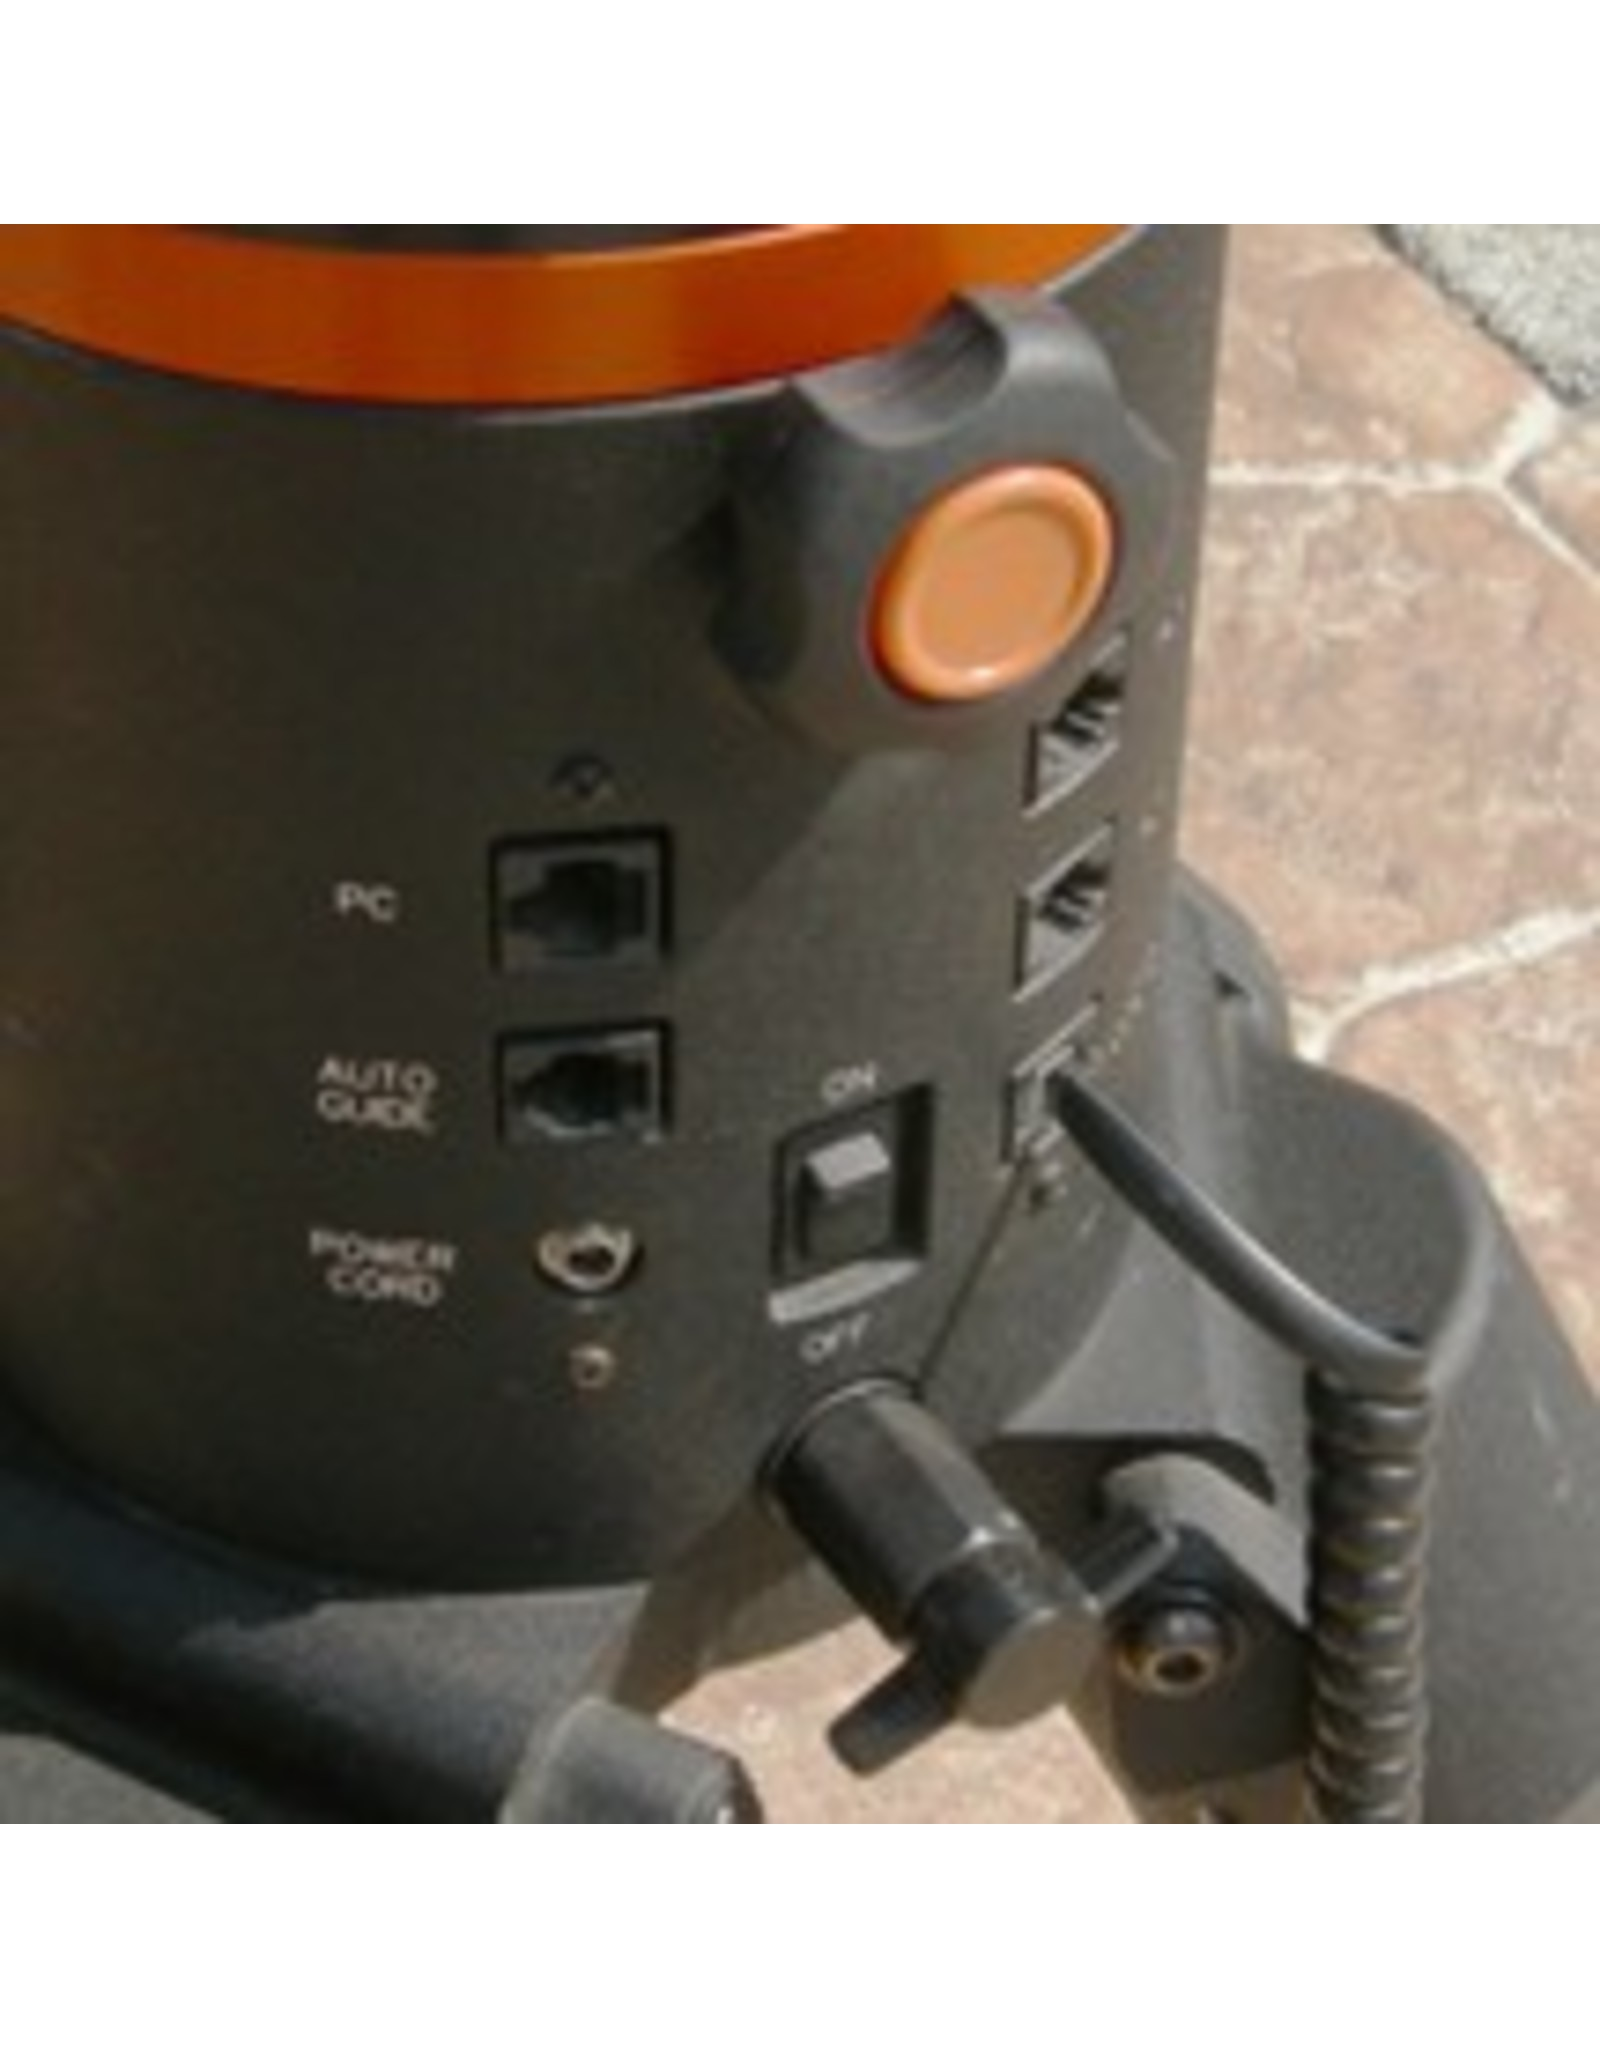 Bob's Knobs NO-TOOLS KIT FOR CELESTRON CGE MOUNT